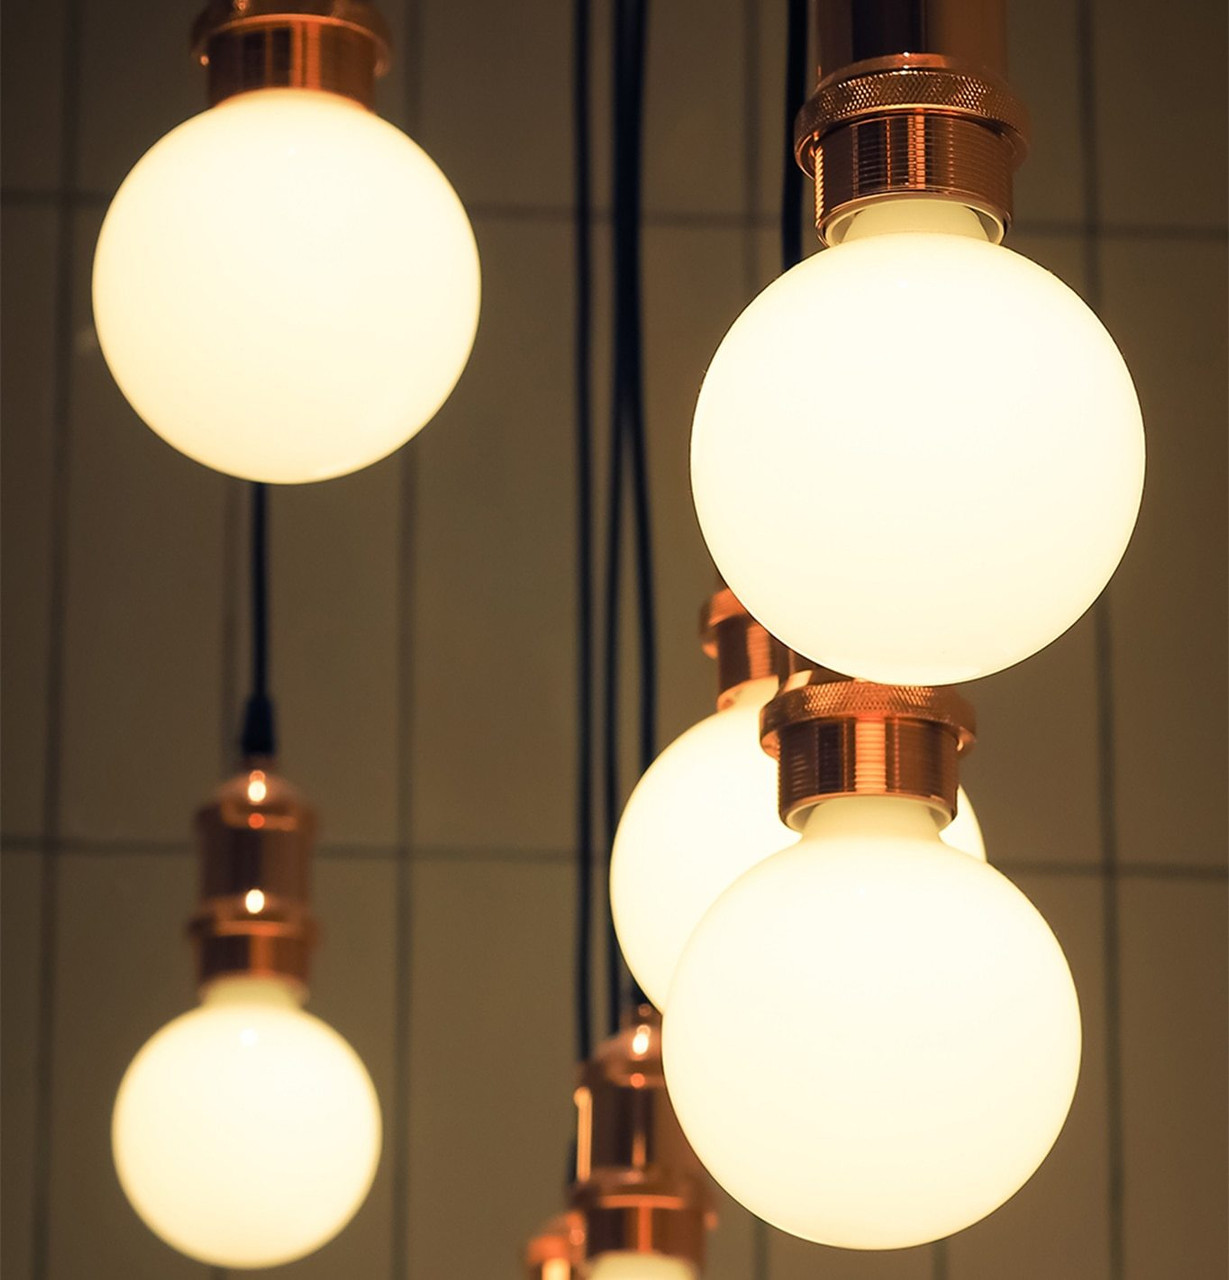 Crompton Lamps LED Globe Warm White Light Bulbs